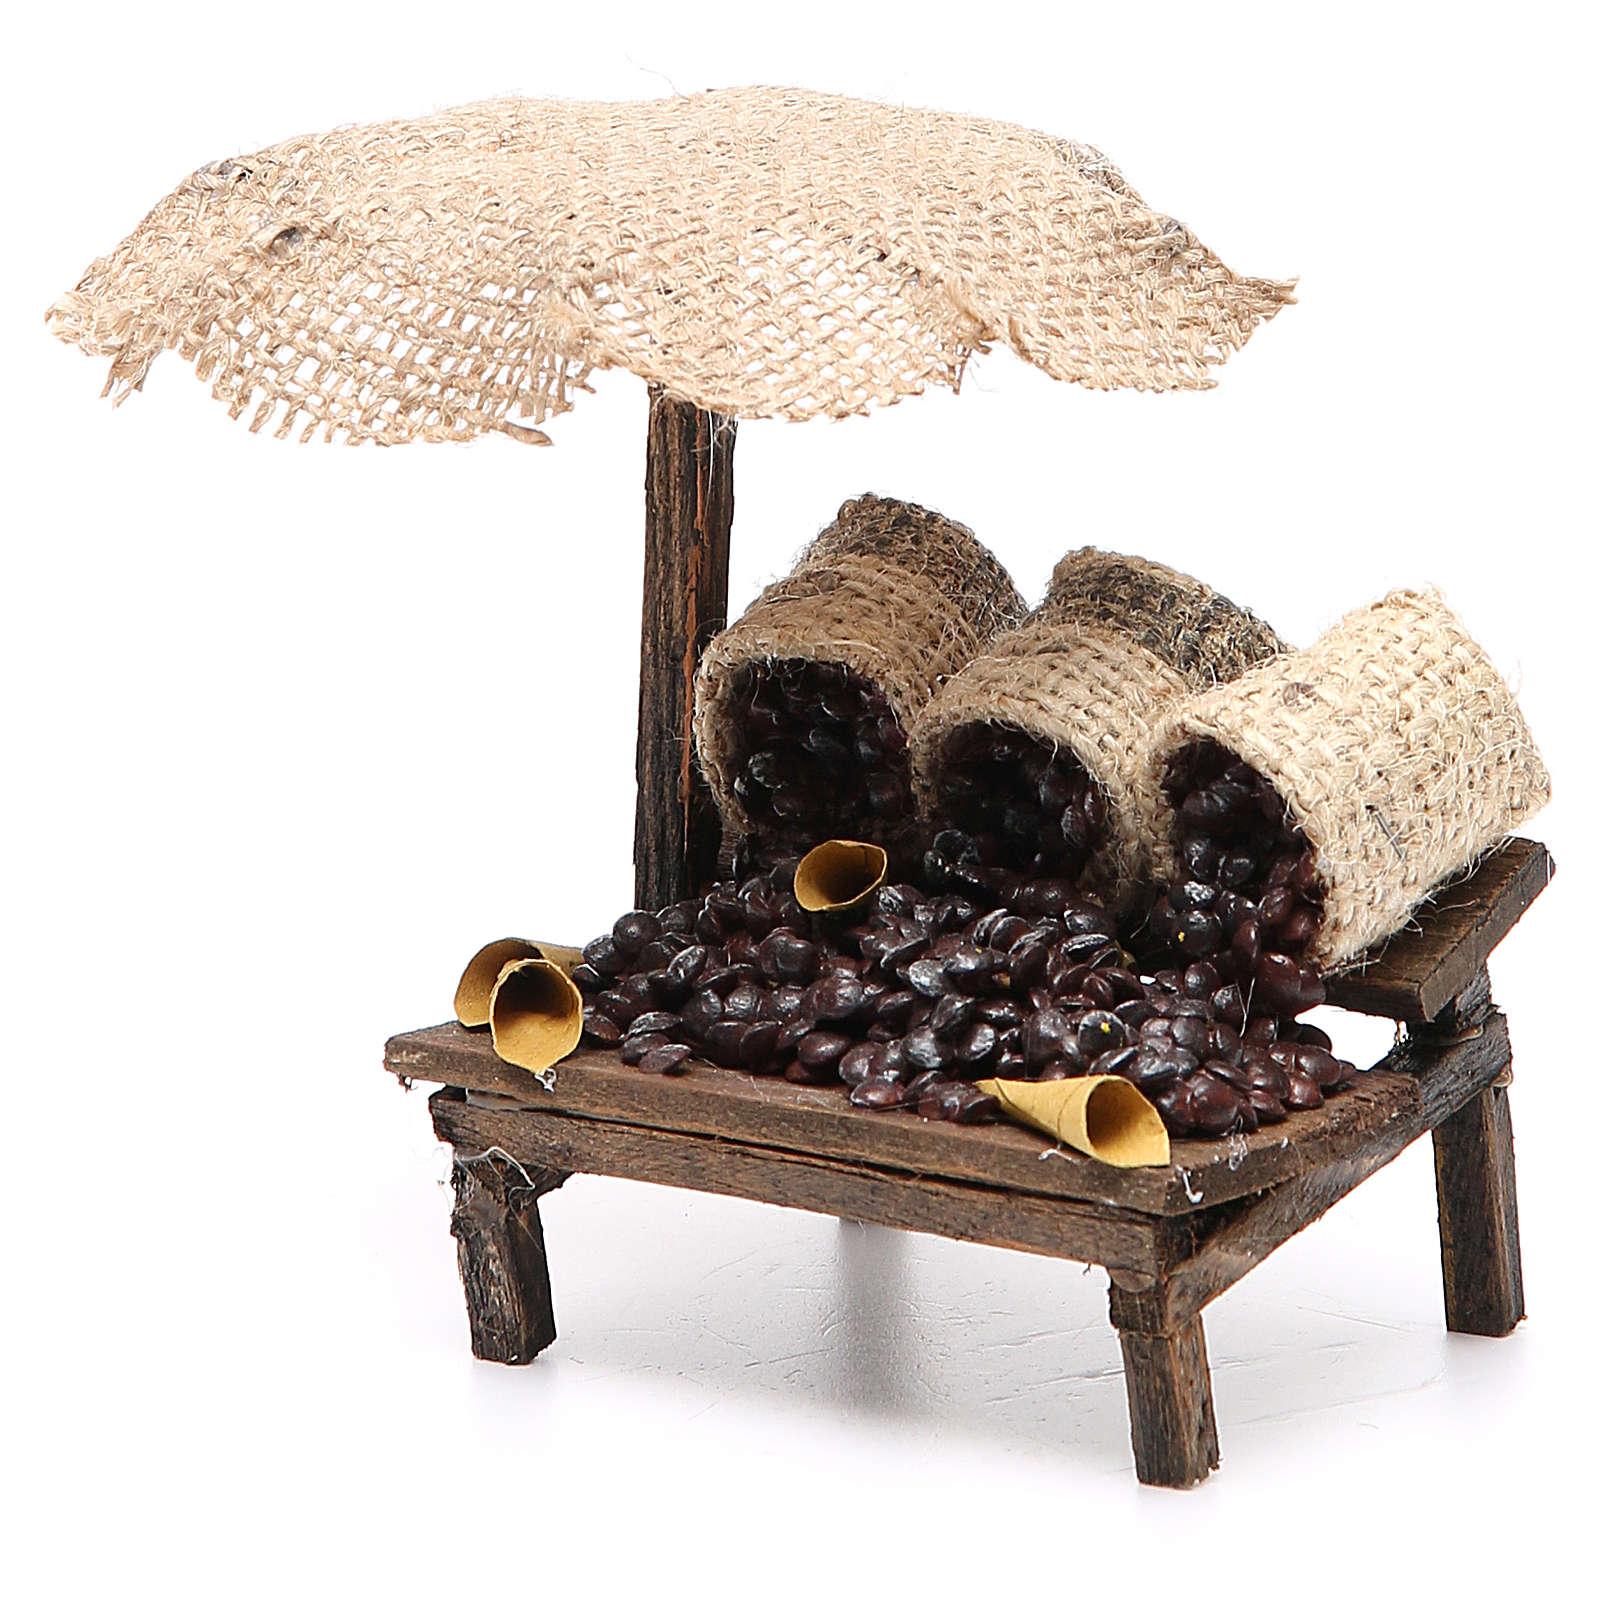 Workshop nativity with beach umbrella, chestnuts 12x10x12cm 4